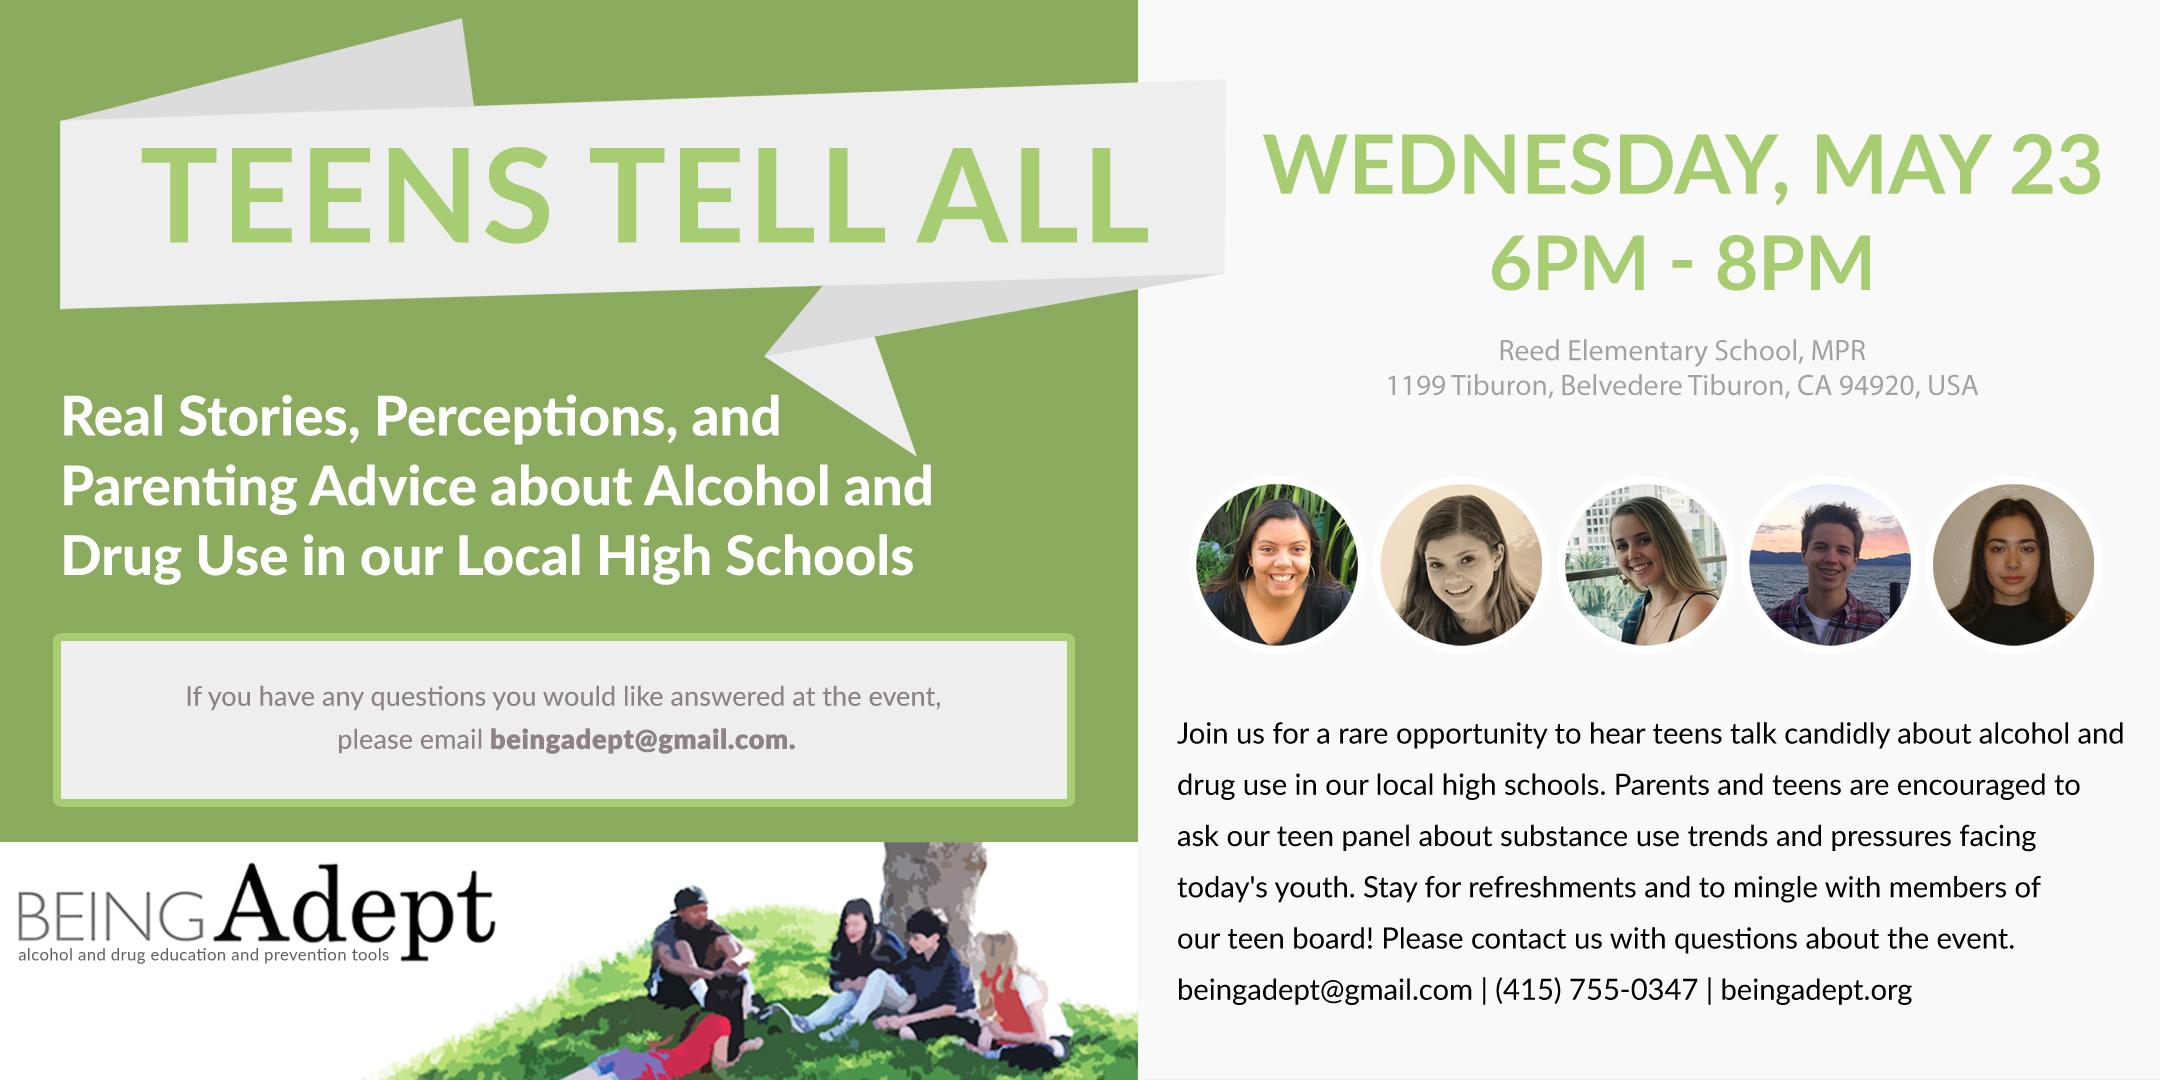 Teens Tell All EventBrite Flyer